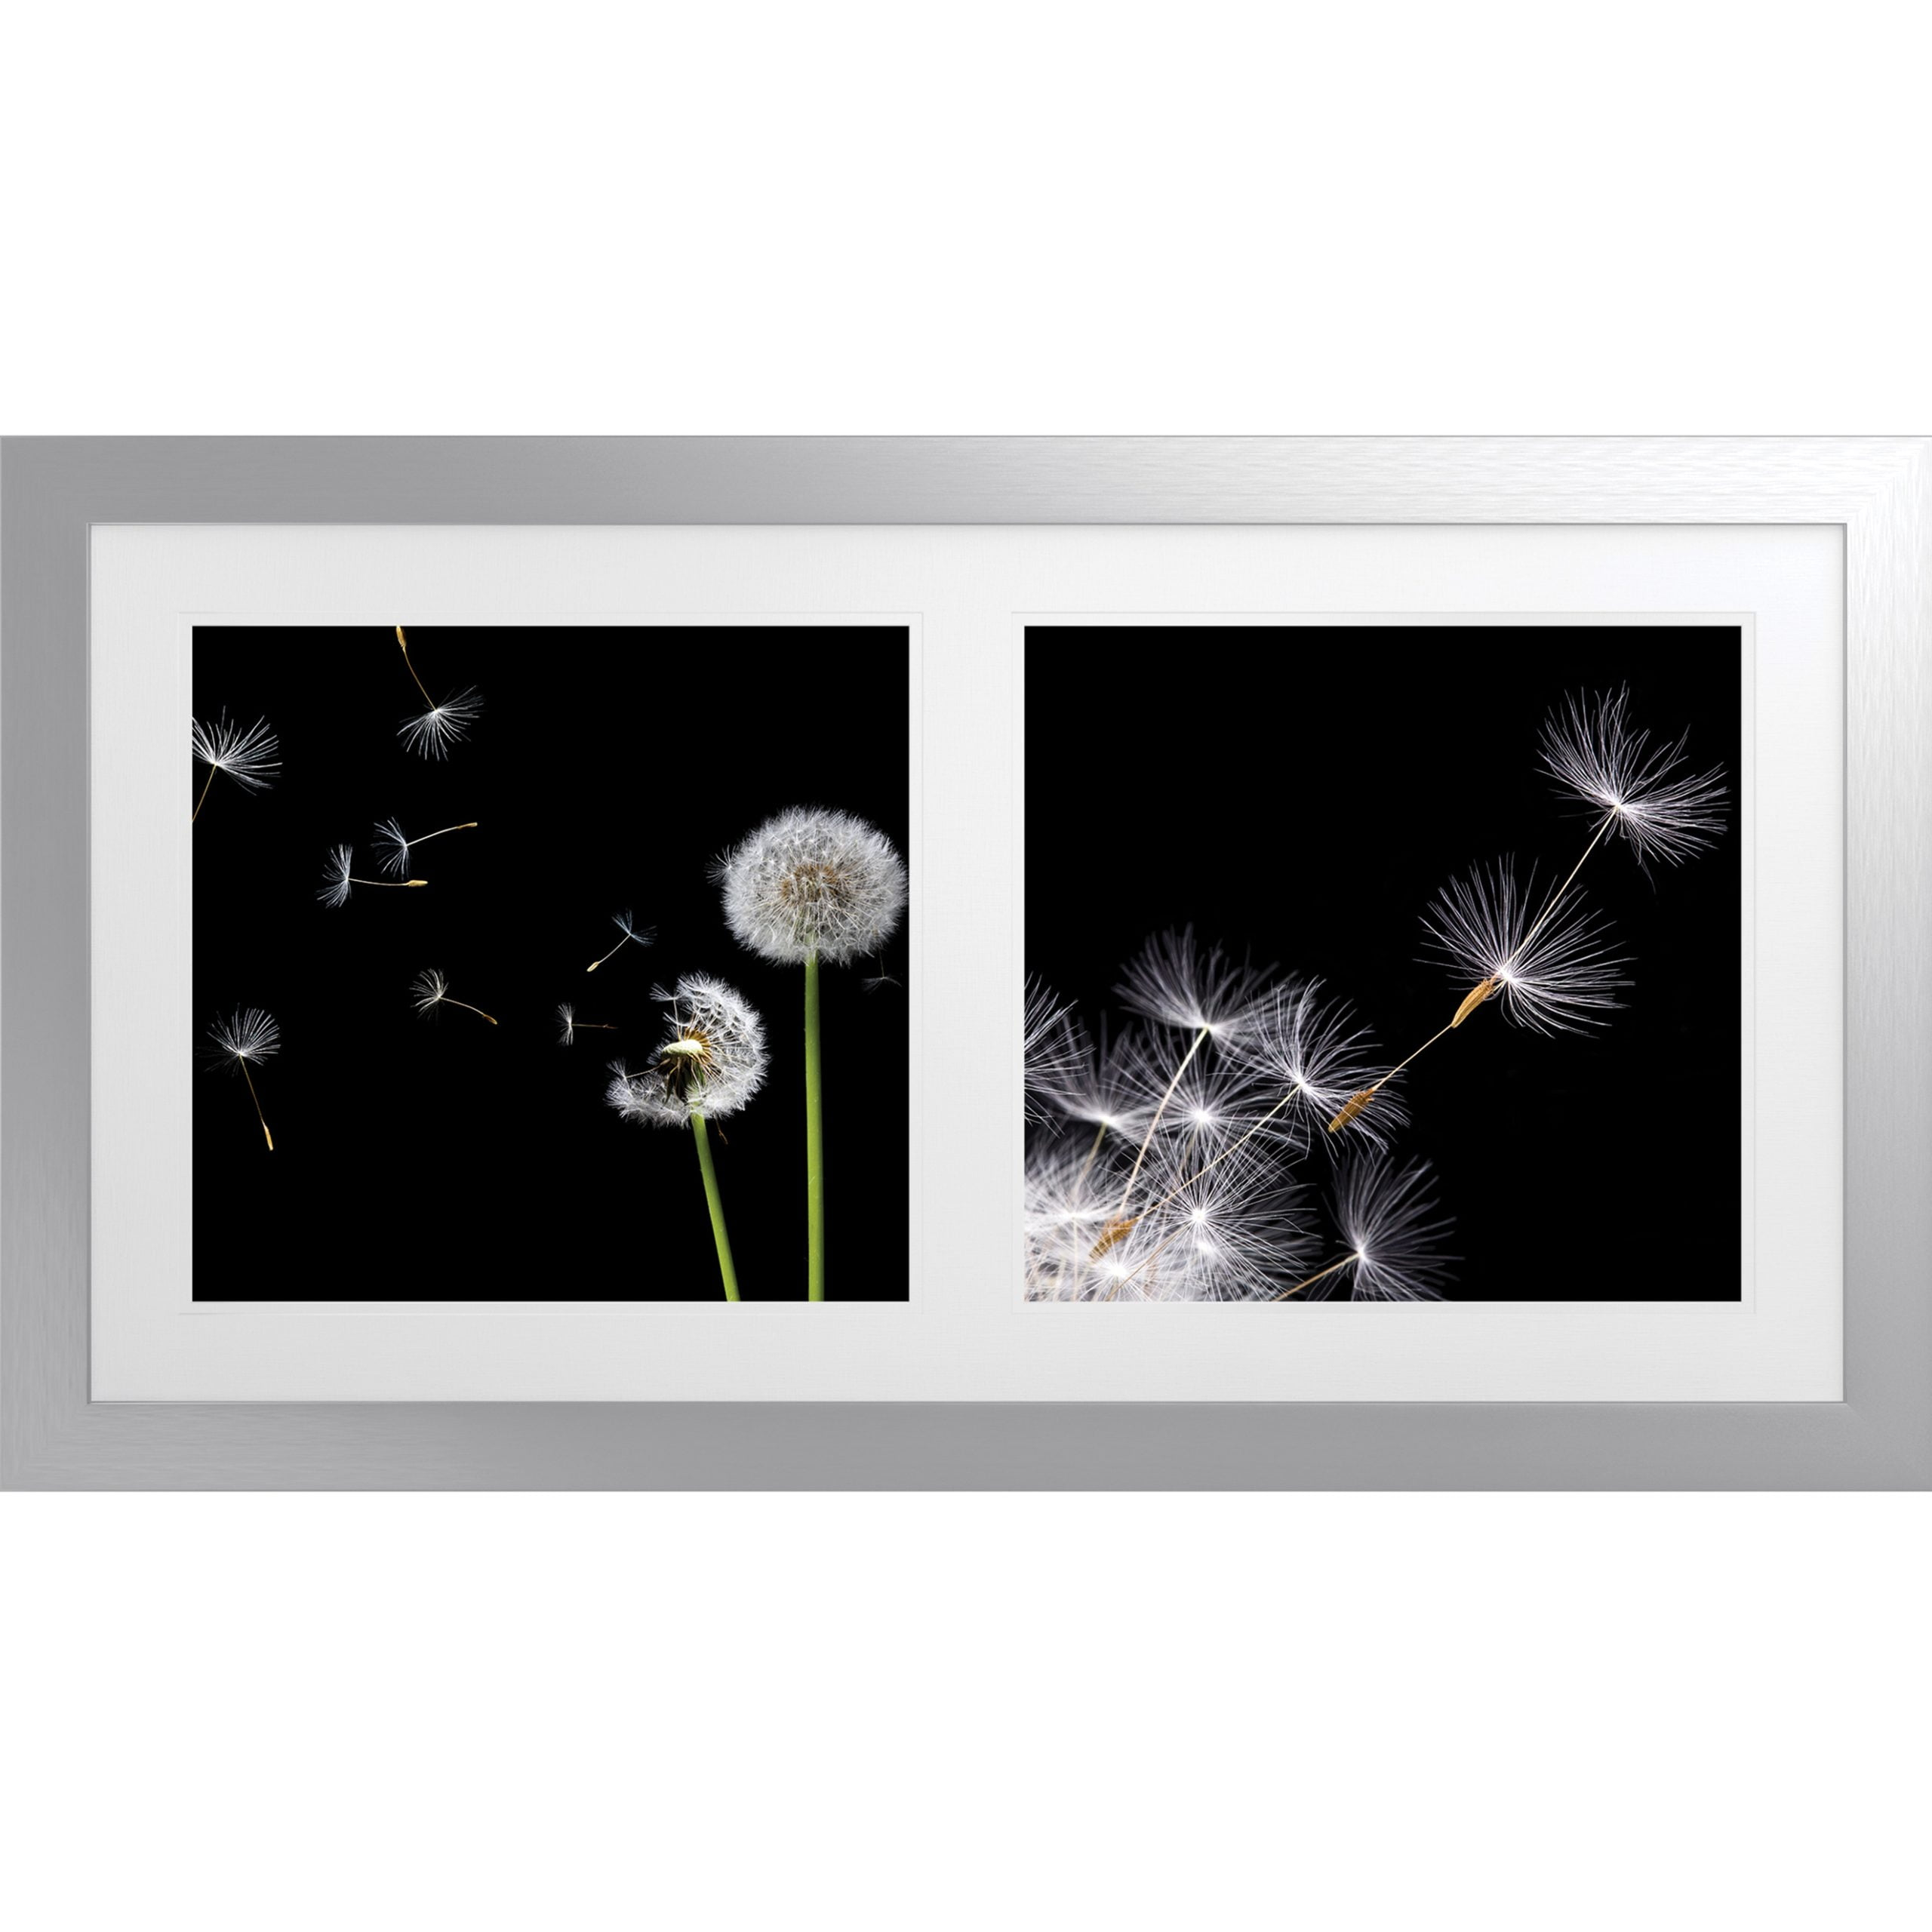 Wisp Artwork with Fornari Silver Frame